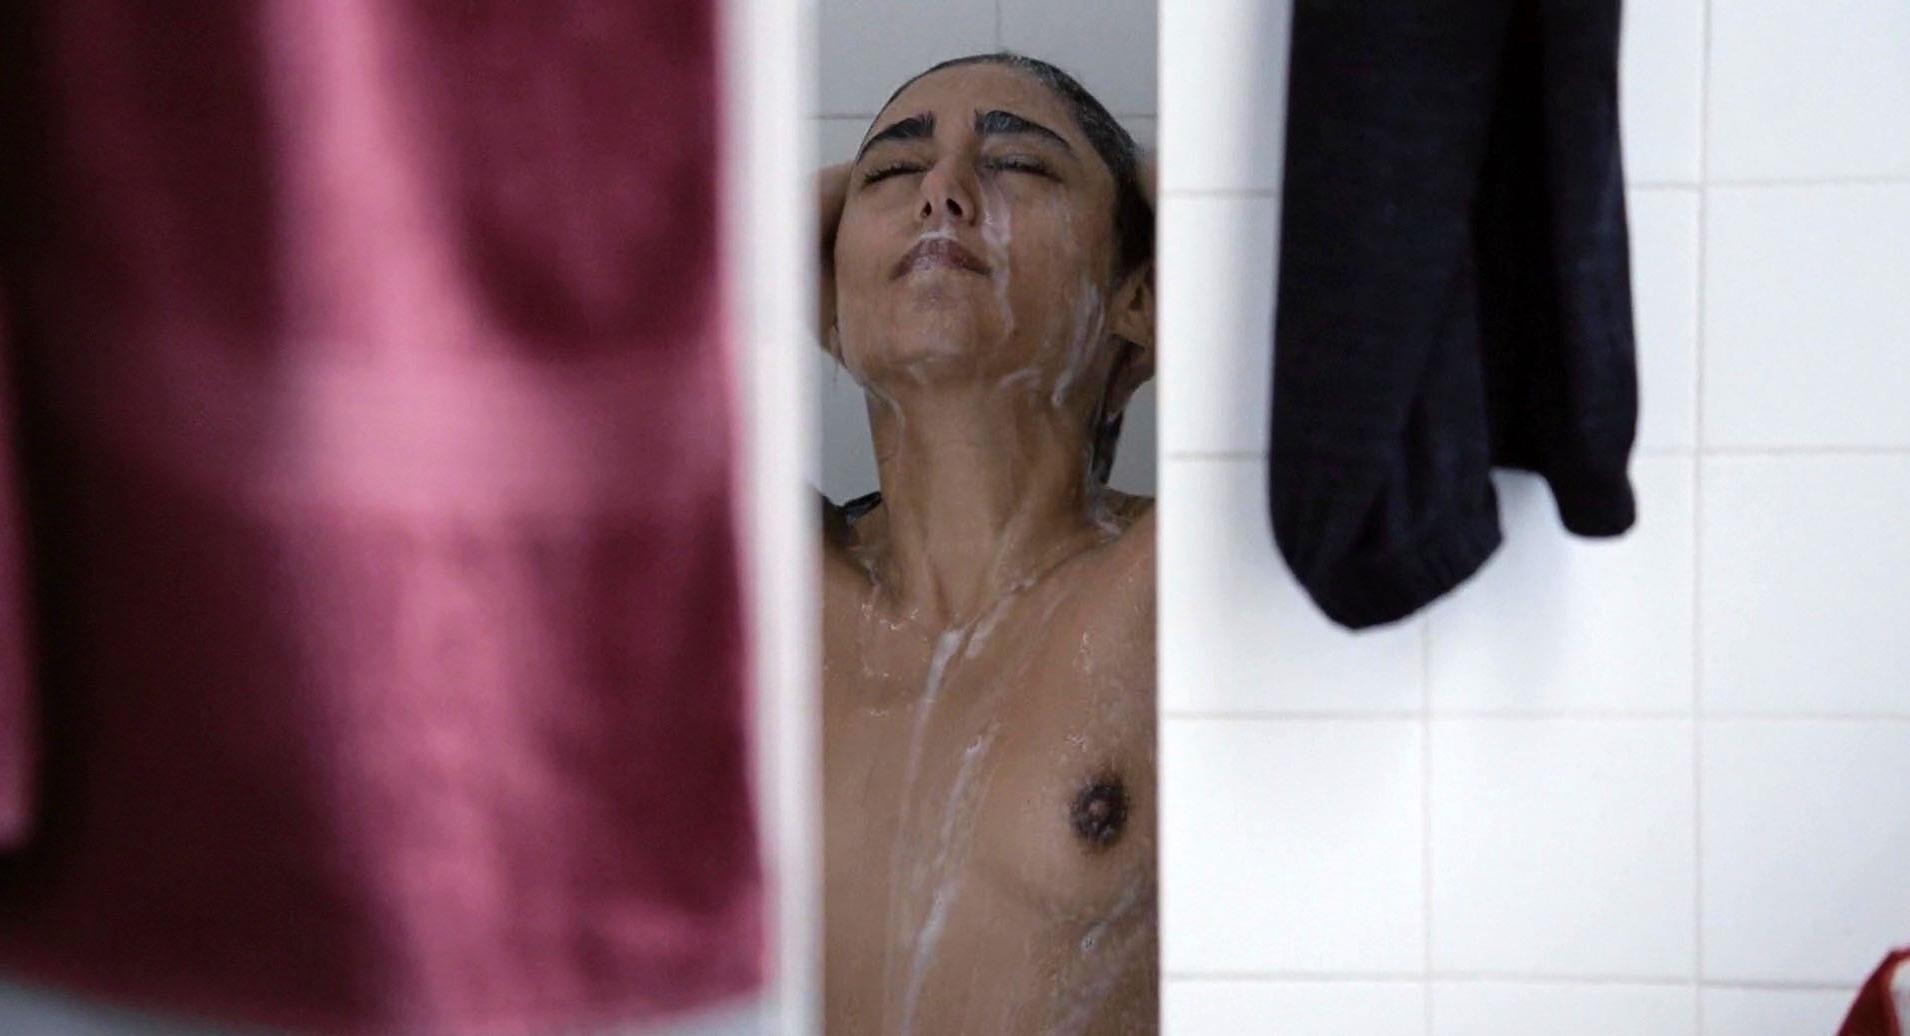 Fotos golshifteh farahani nackt Nude Photo